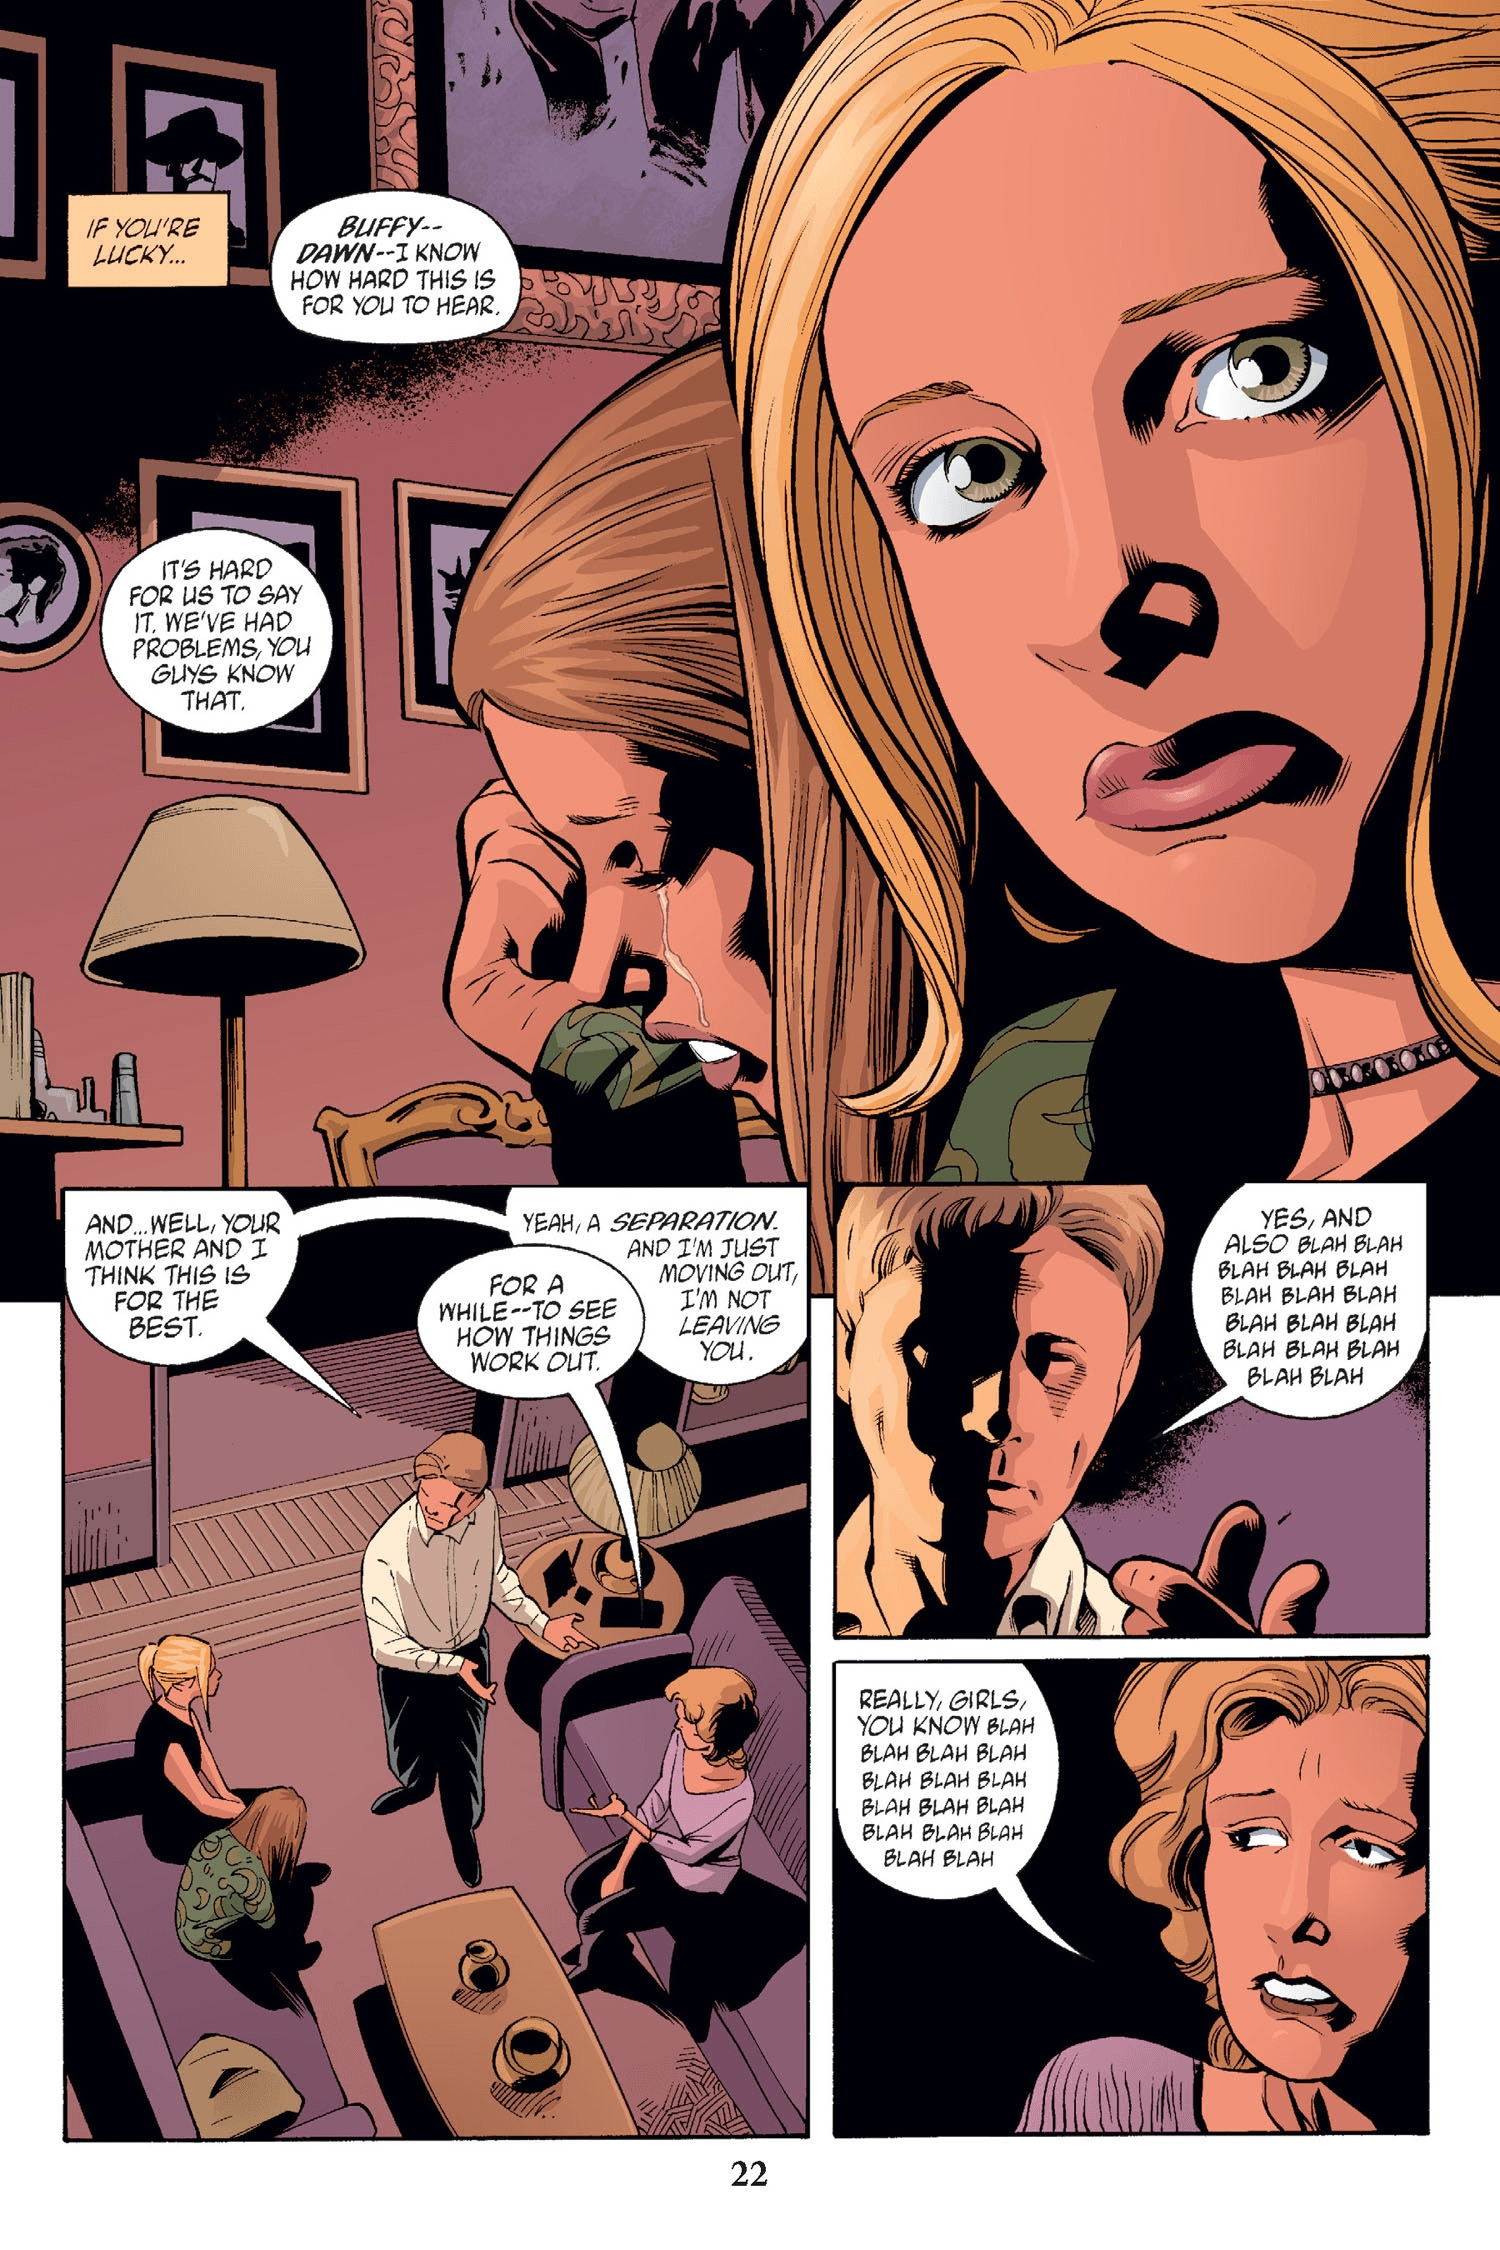 Read online Buffy the Vampire Slayer: Omnibus comic -  Issue # TPB 2 - 21